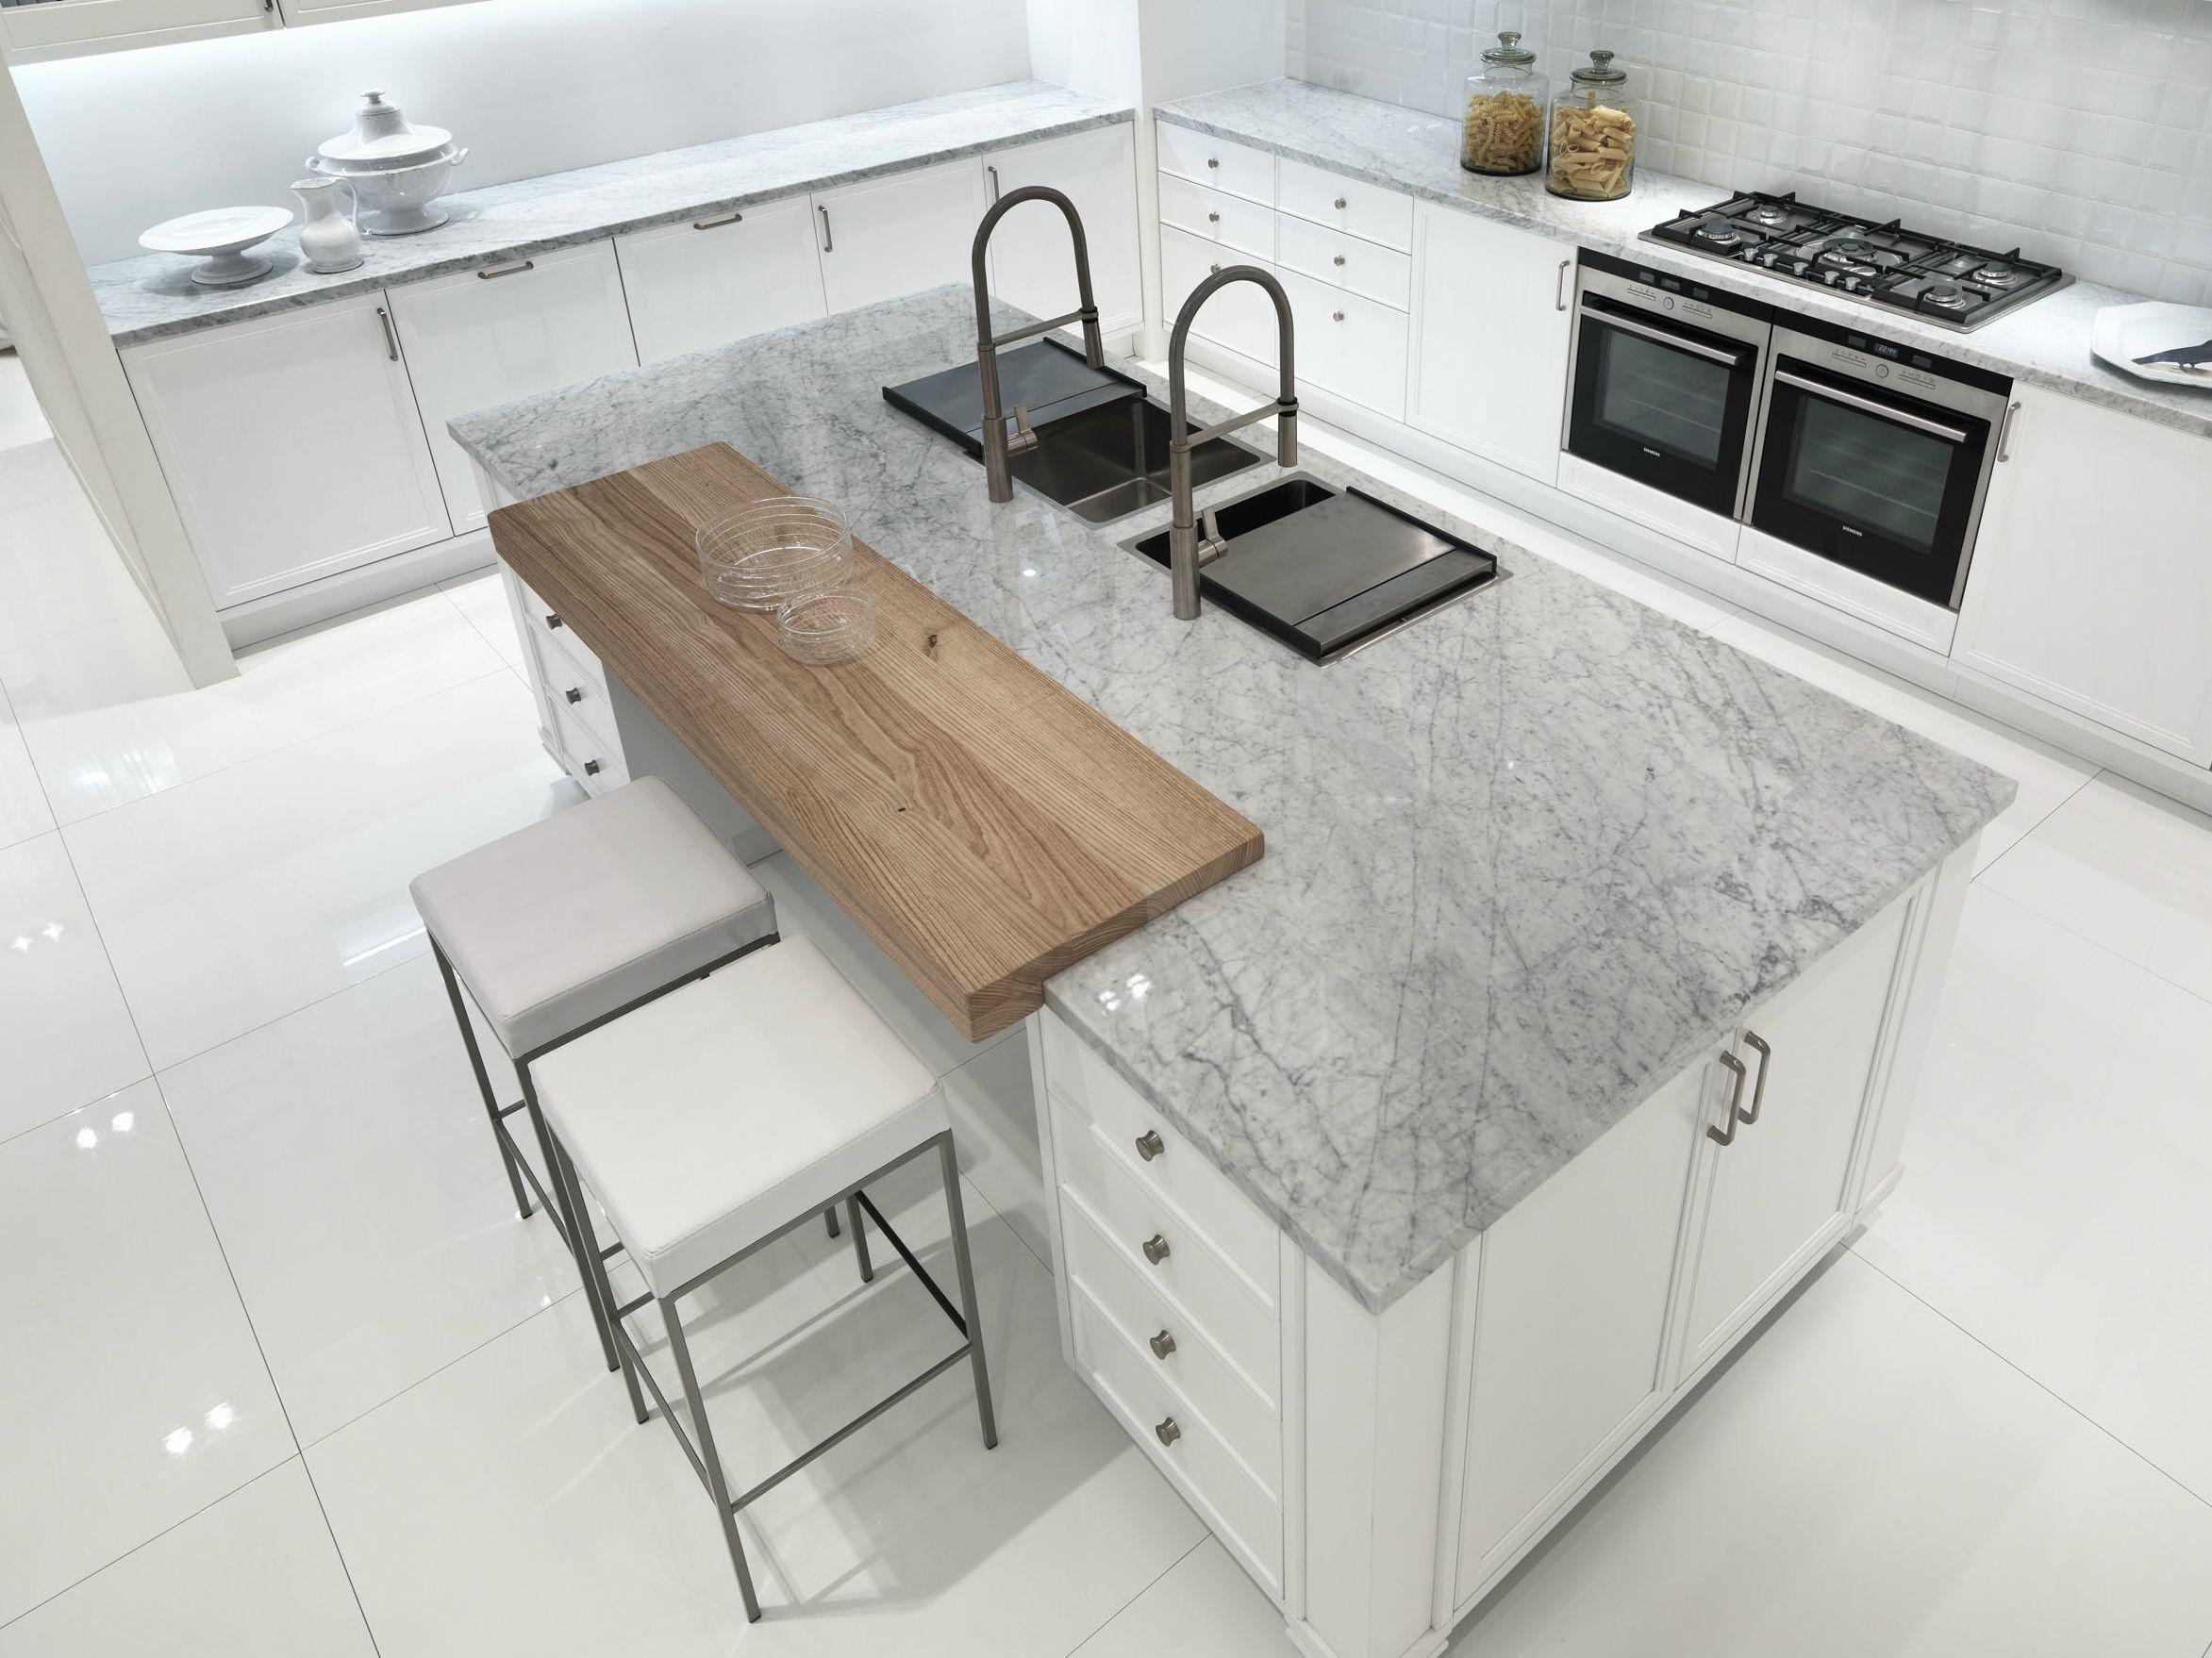 avenue cucina con isola by aster cucine